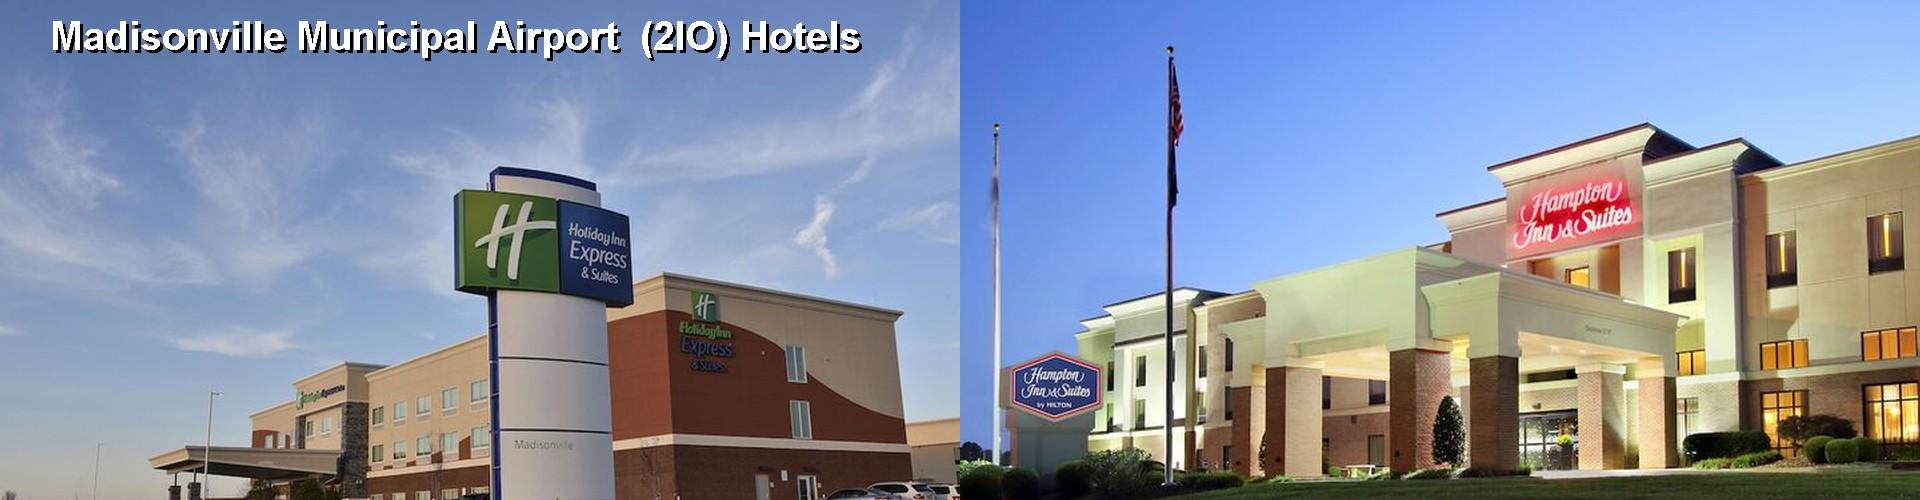 5 Best Hotels Near Madisonville Munil Airport 2io